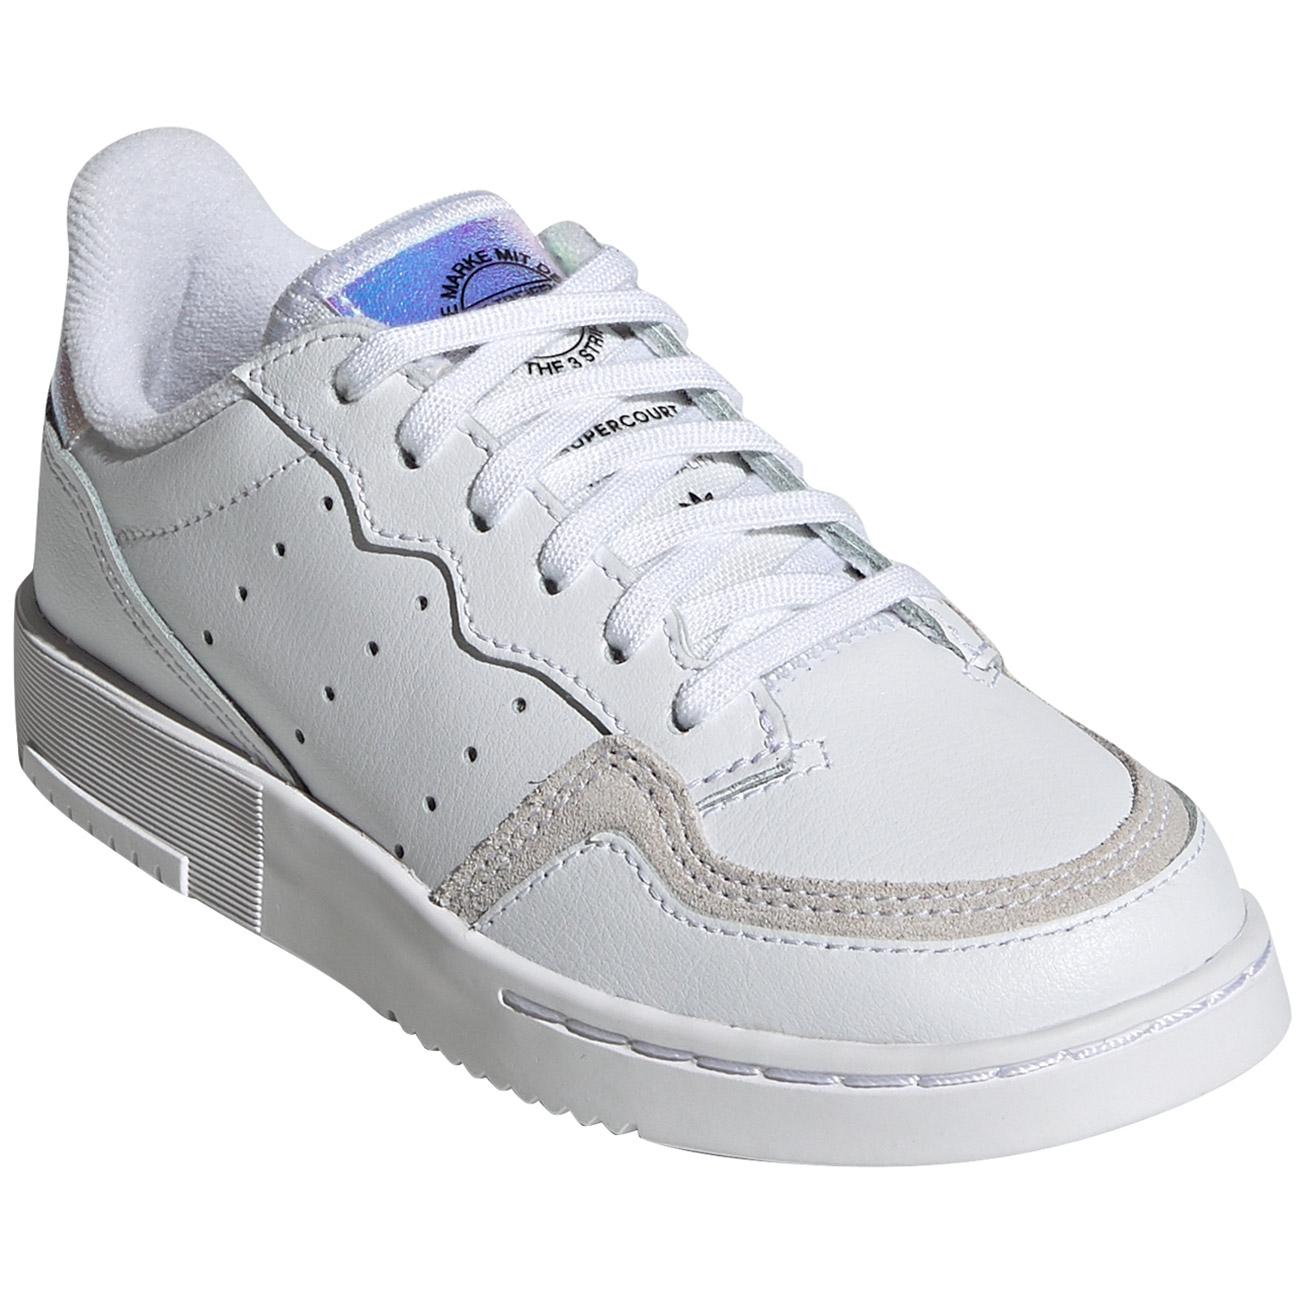 Adidas Supercourt Sneakers White Blanc